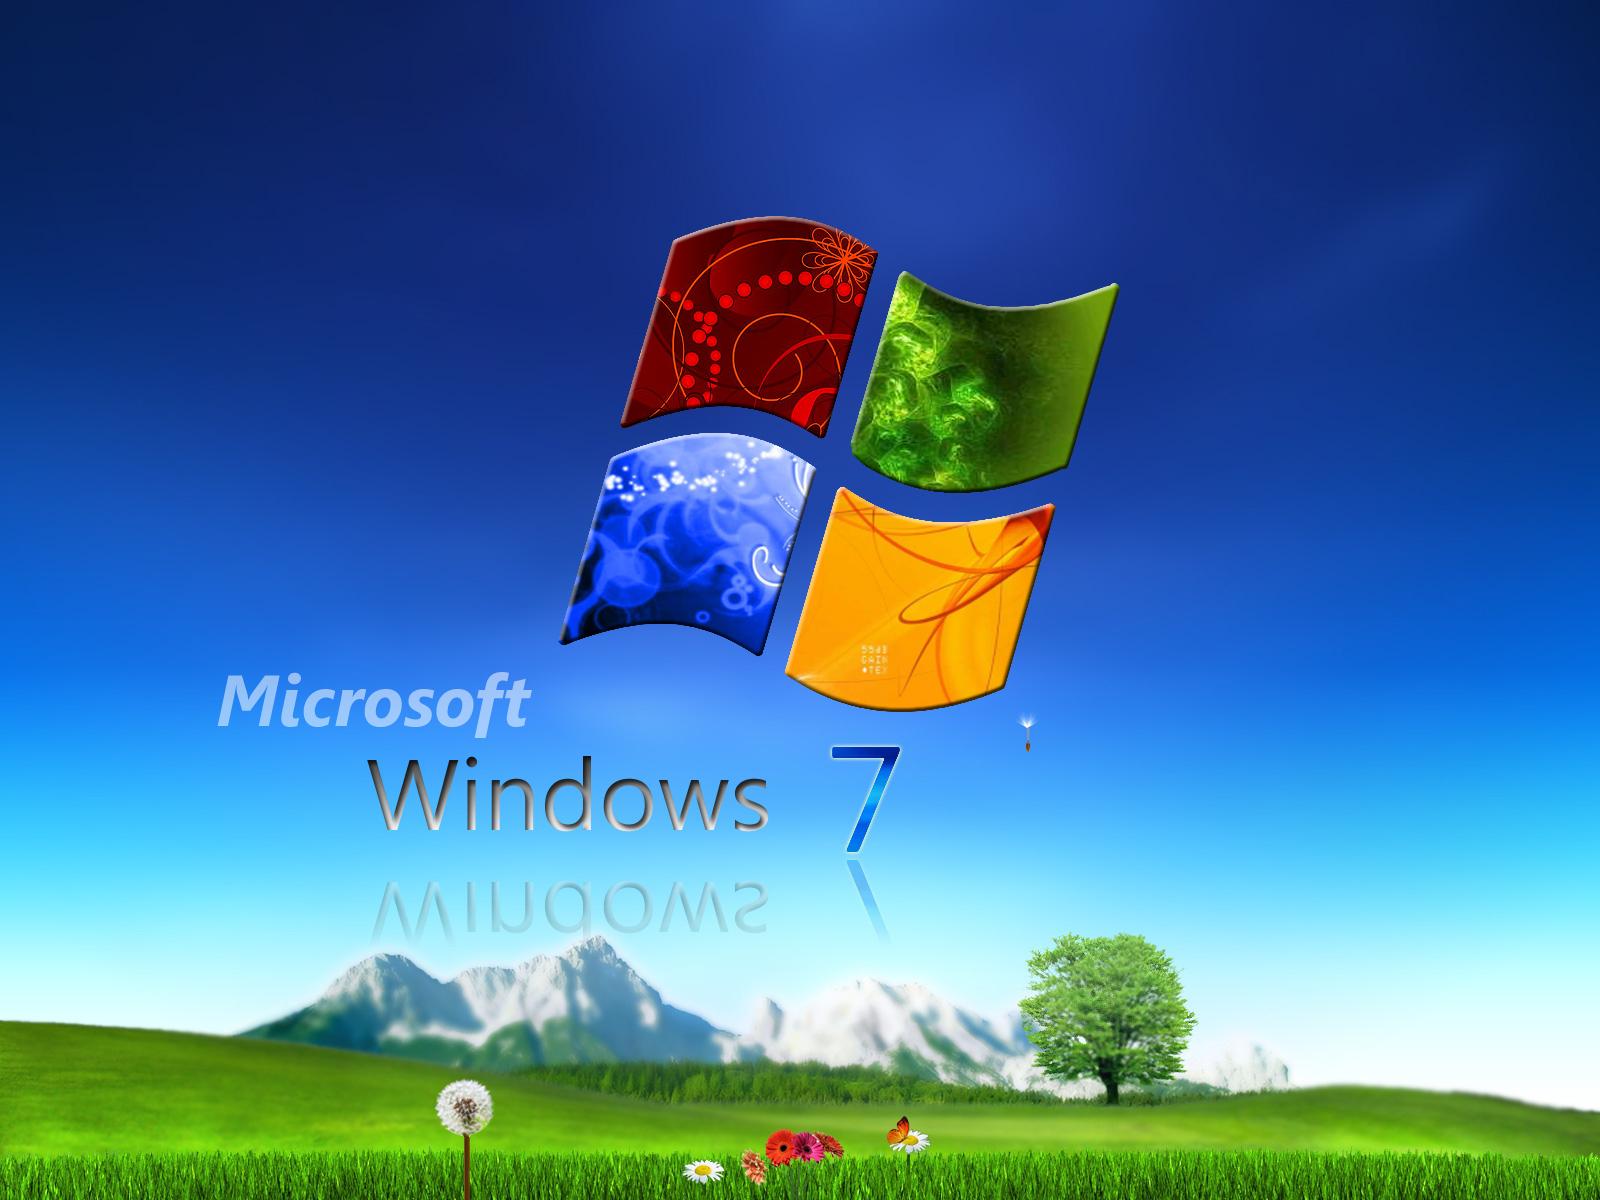 HD Wallpaper of Windows 7 | HD Wallpapers